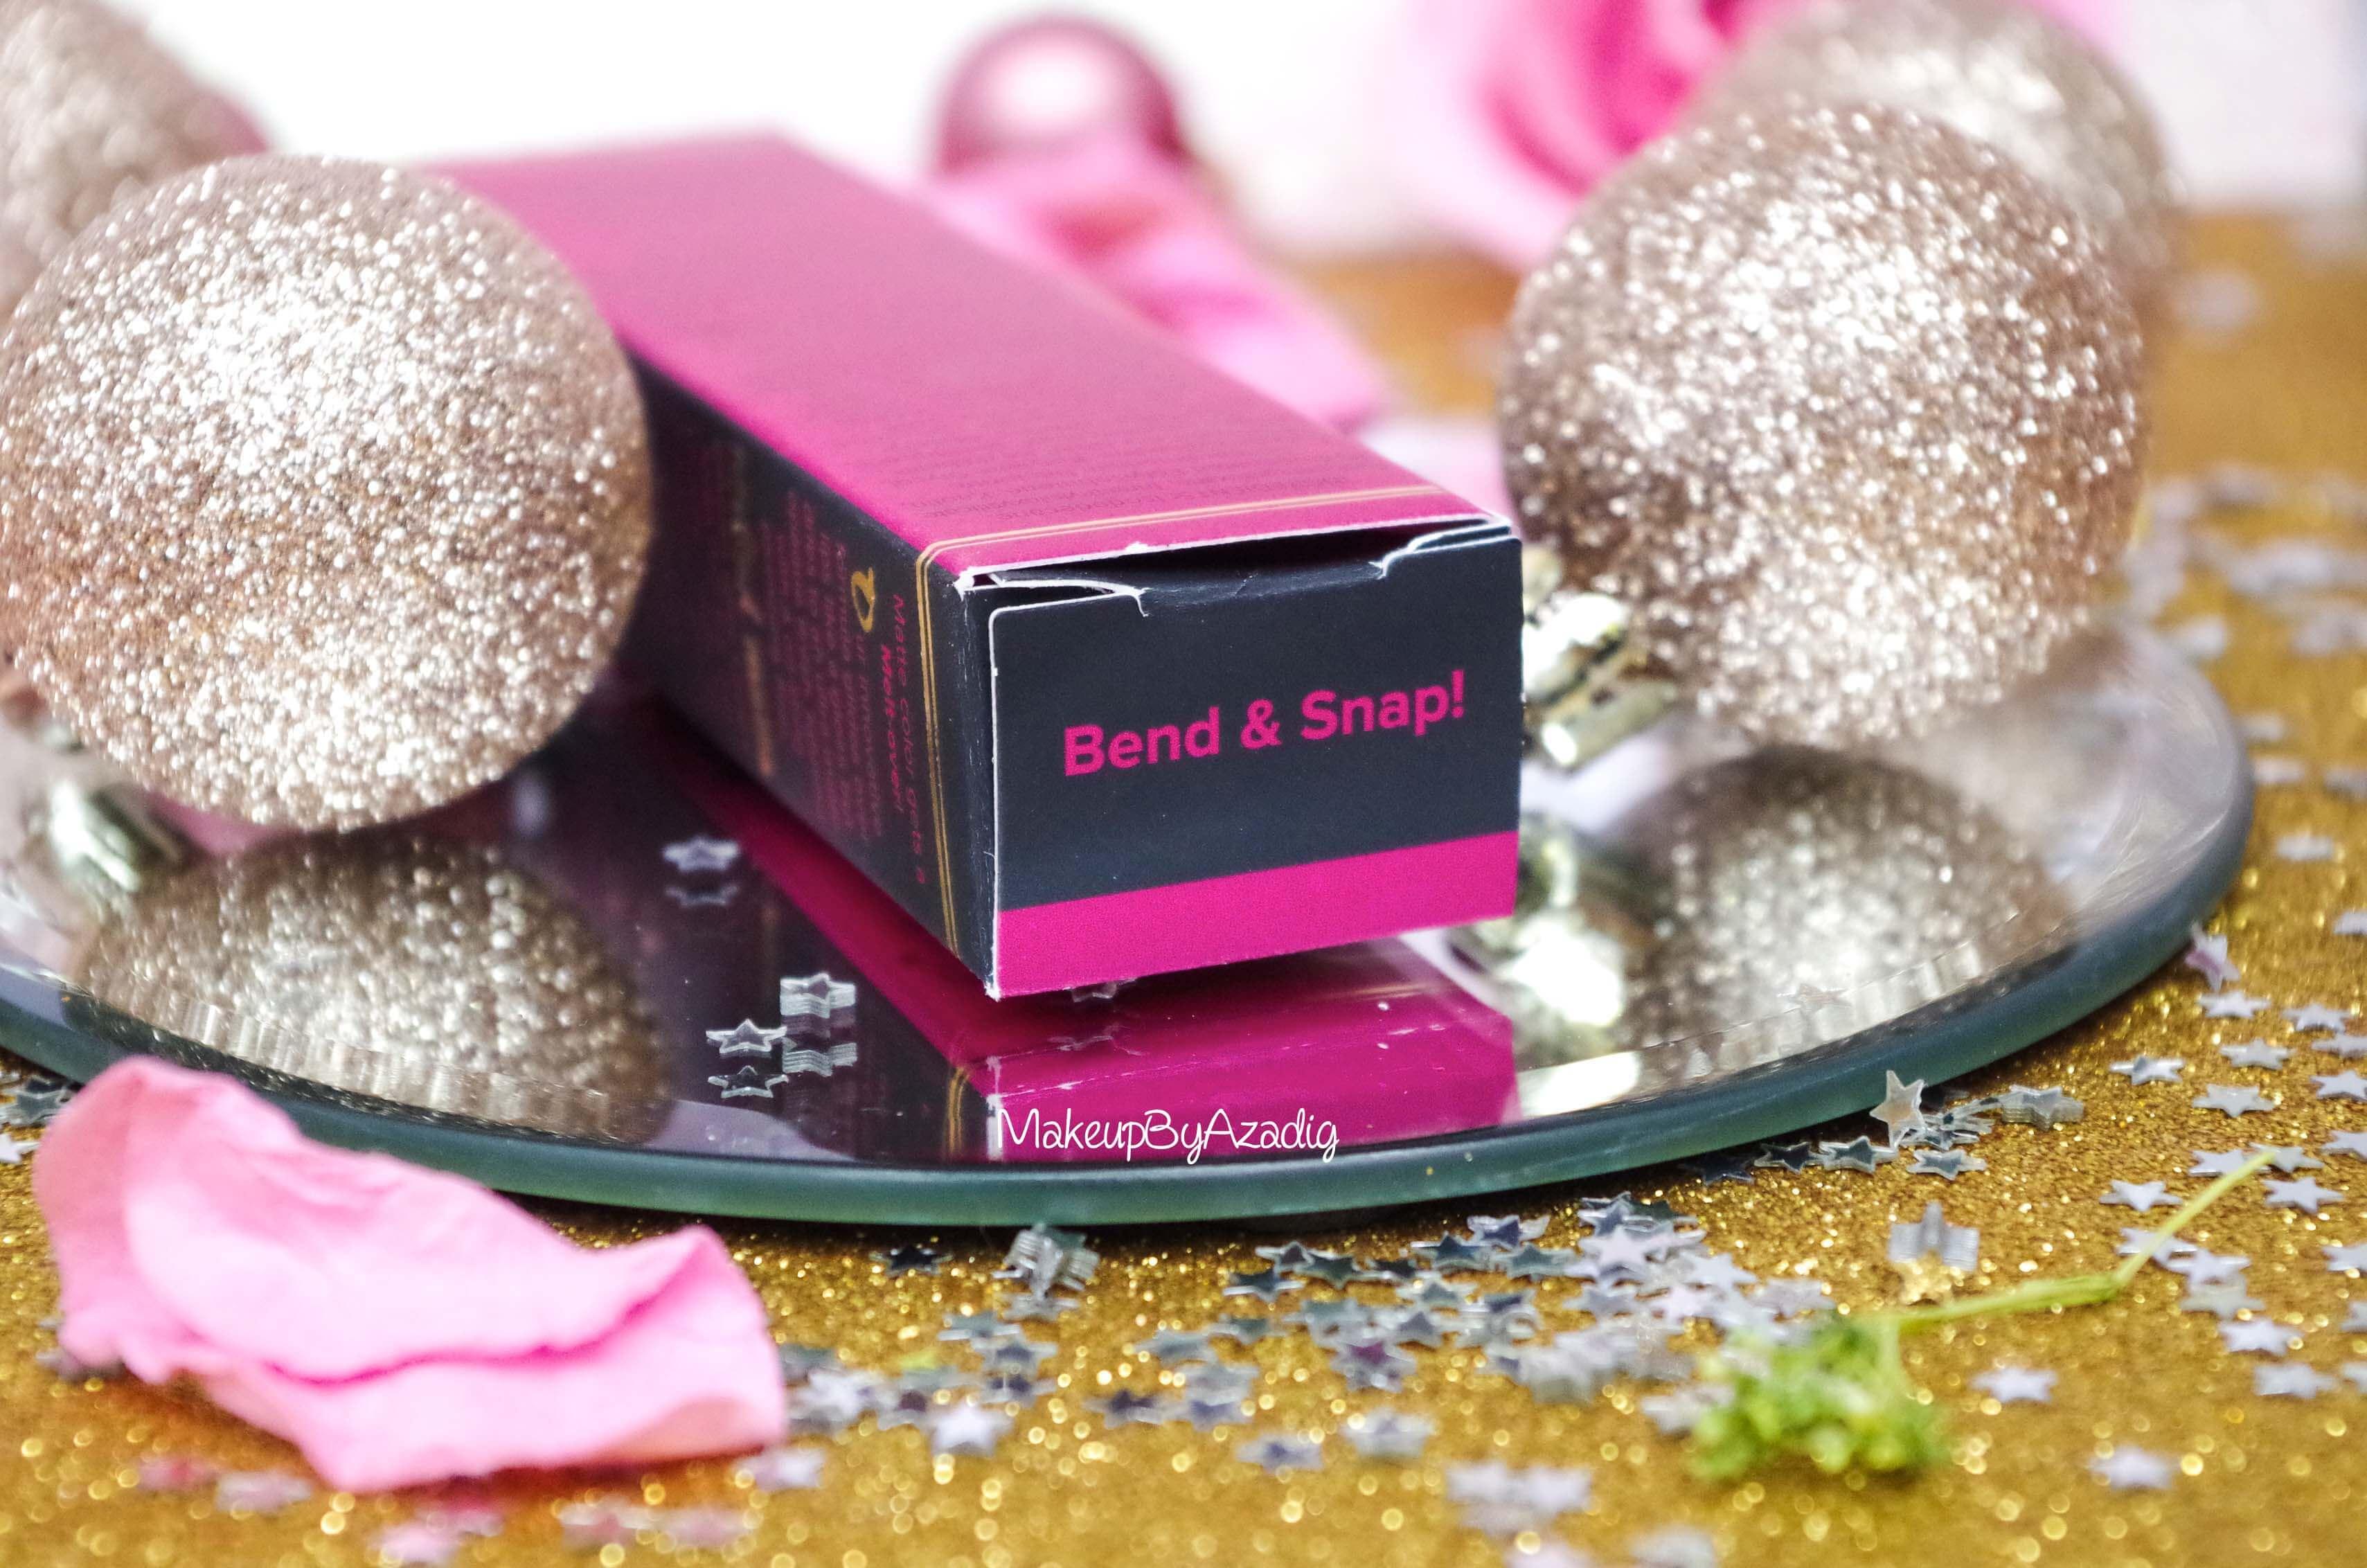 makeupbyazadig-melted-matte-queenb-bendandsnap-influencer-too-faced-rouge-levres-revue-avis-prix-sephora-paris-blog-liquide-framboise